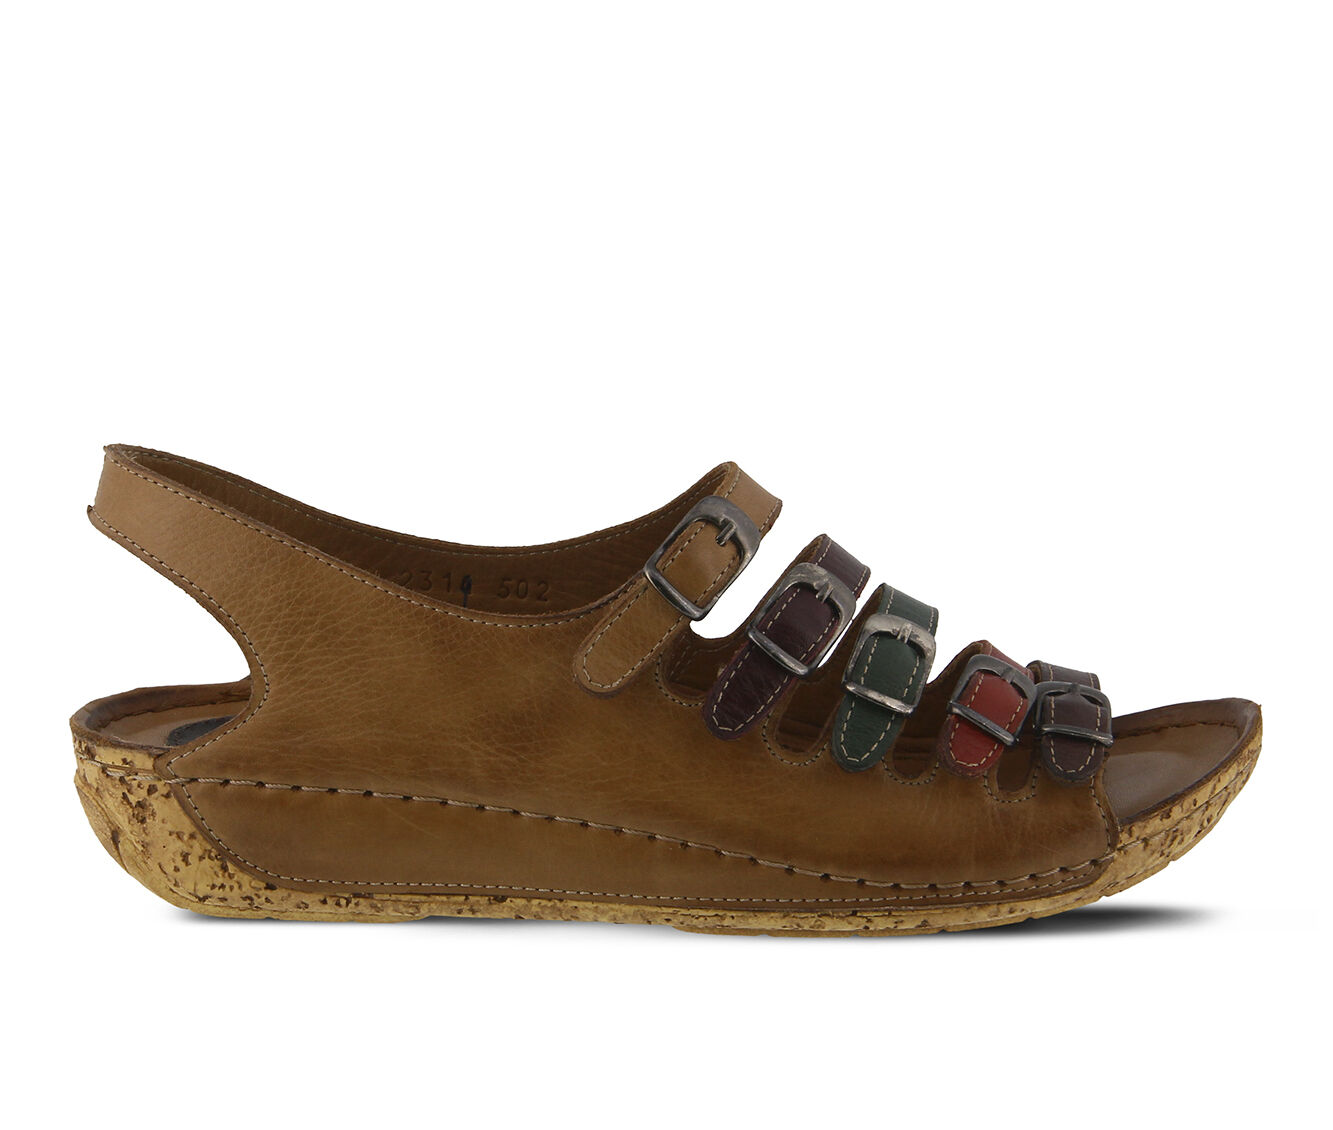 uk shoes_kd6869